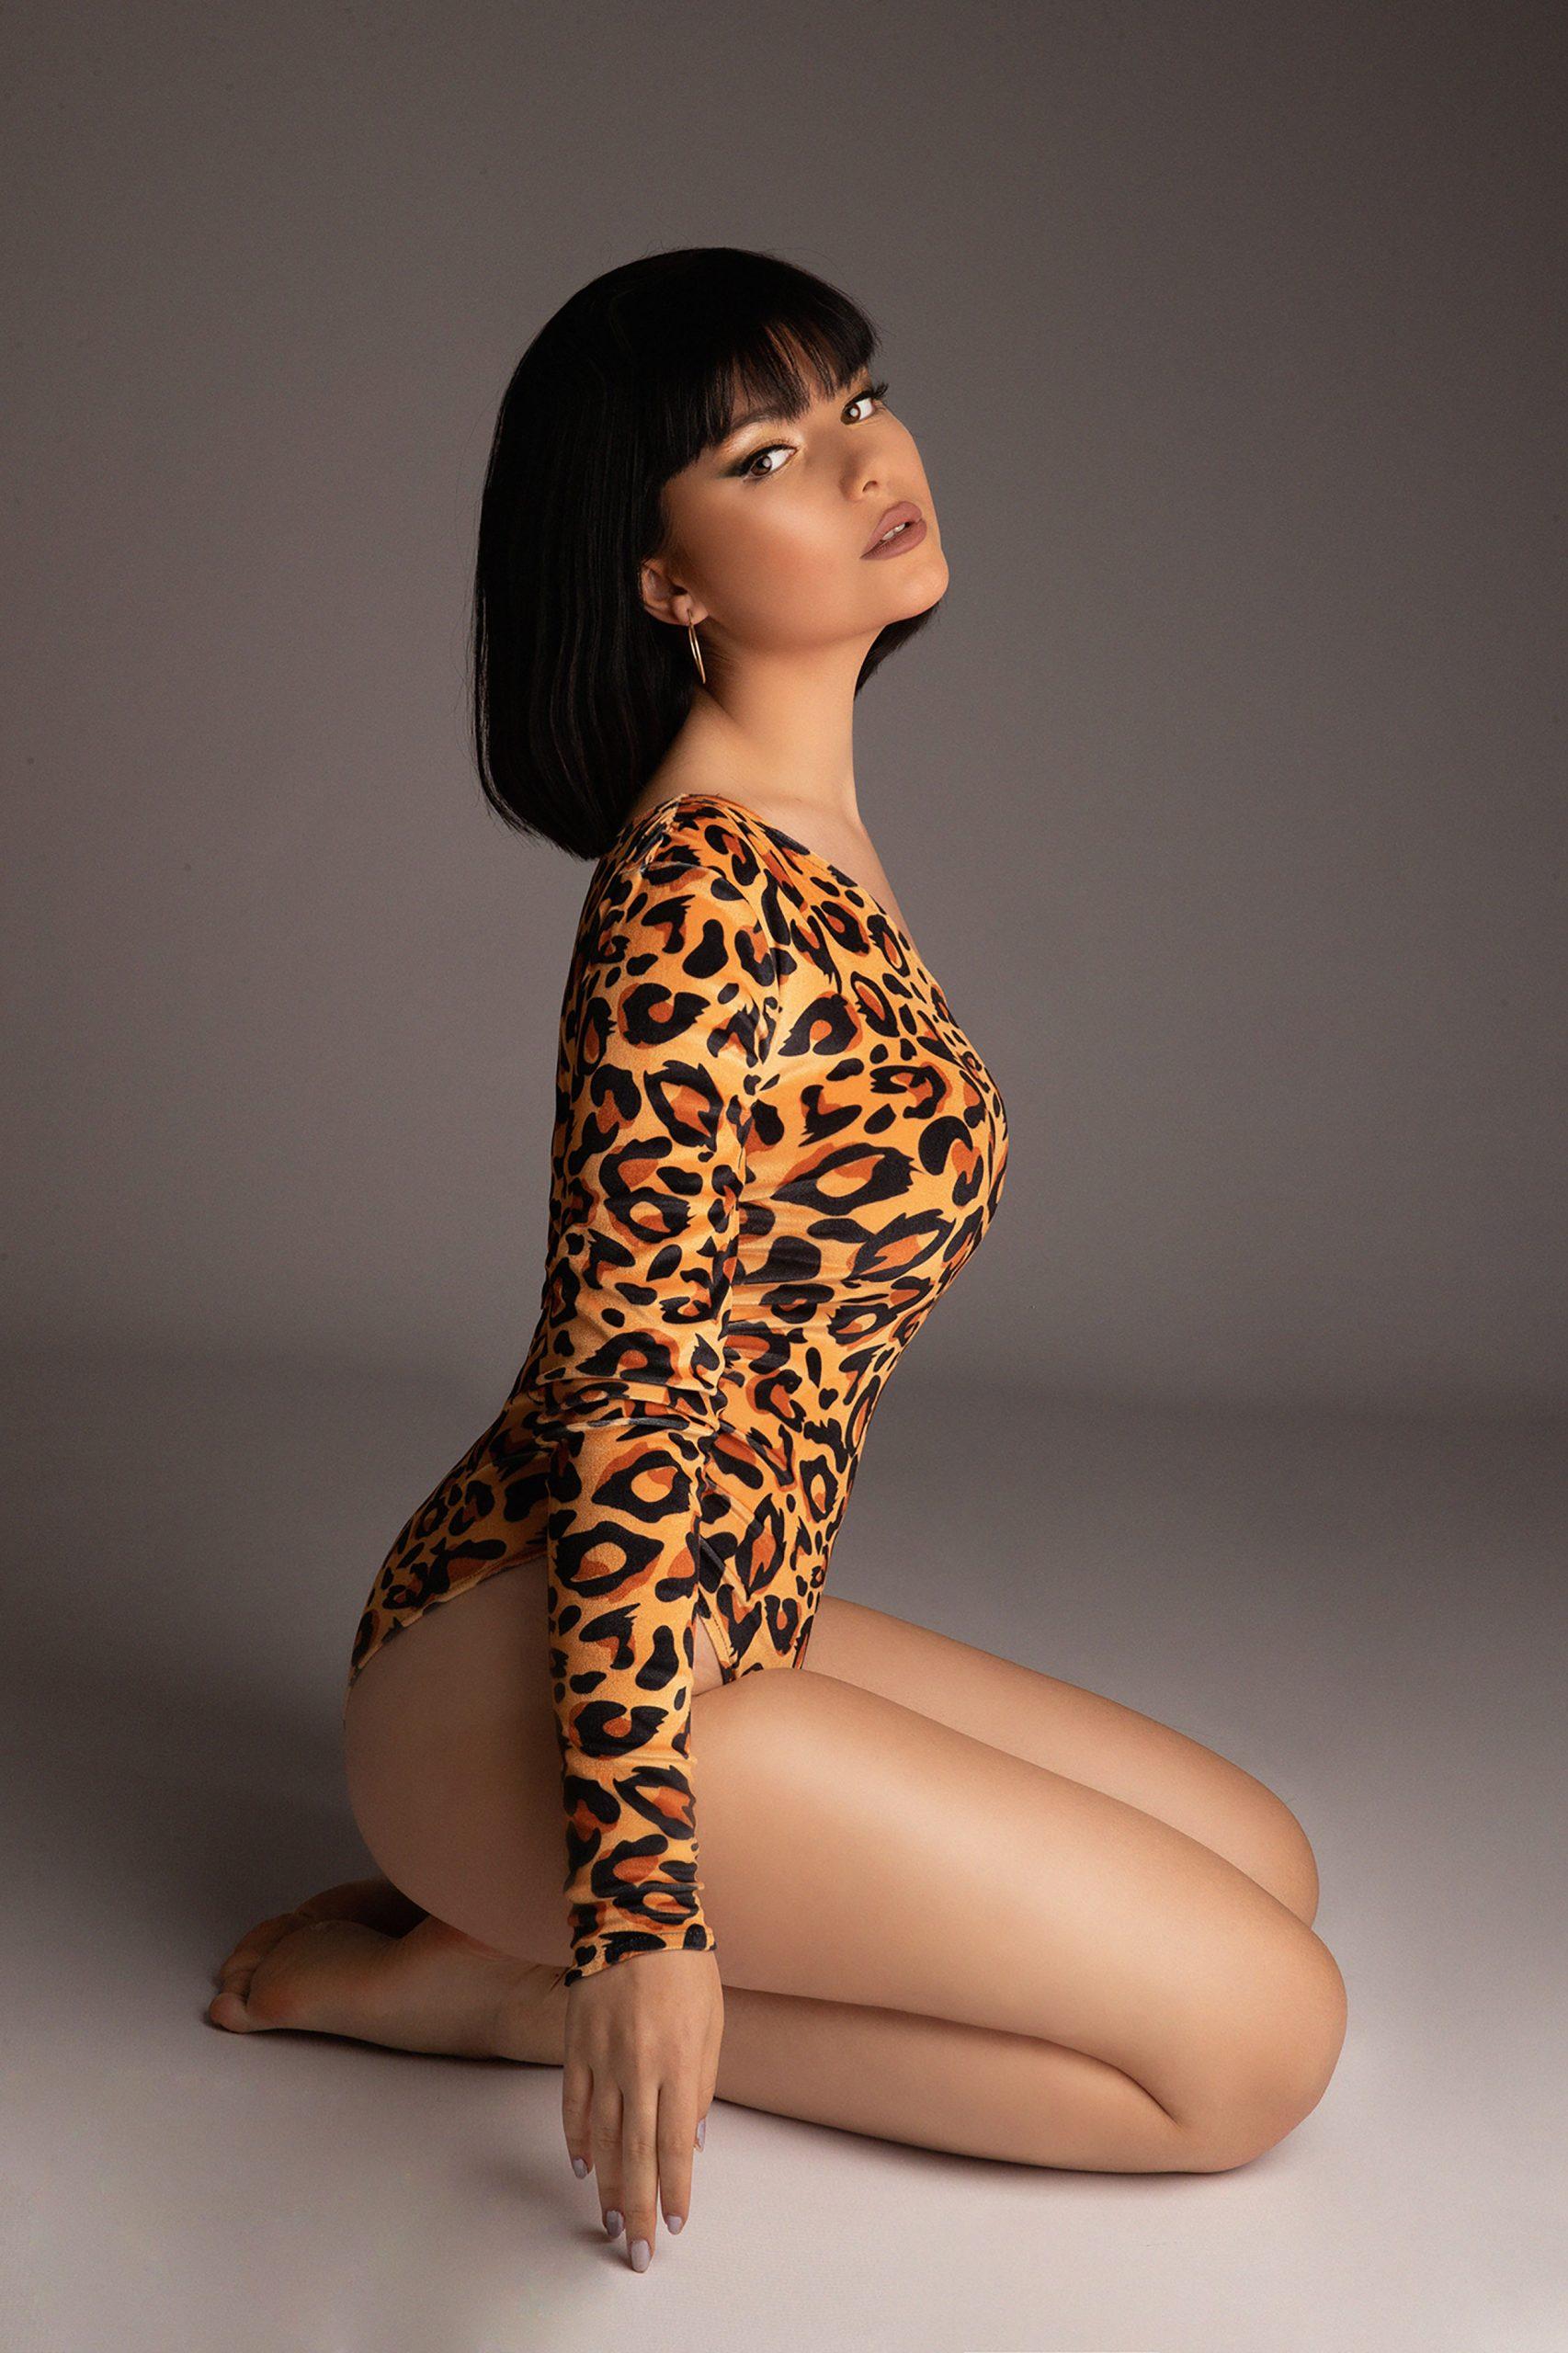 Jungle Humans' Halloween bodysuit